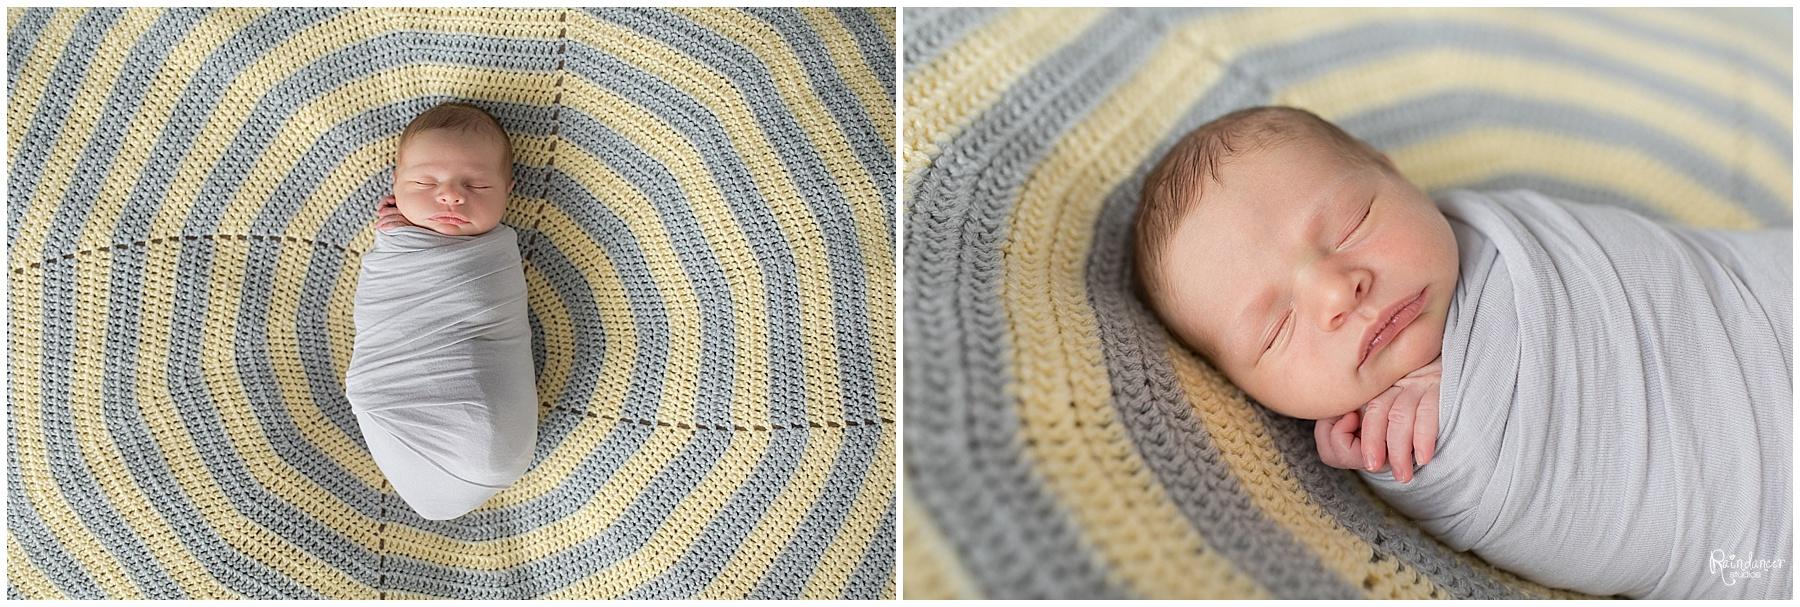 Newborn baby boy sleeping on striped blanket in a swaddle by Raindancer Studios Indianapolis Newborn Photographer Jill Howell